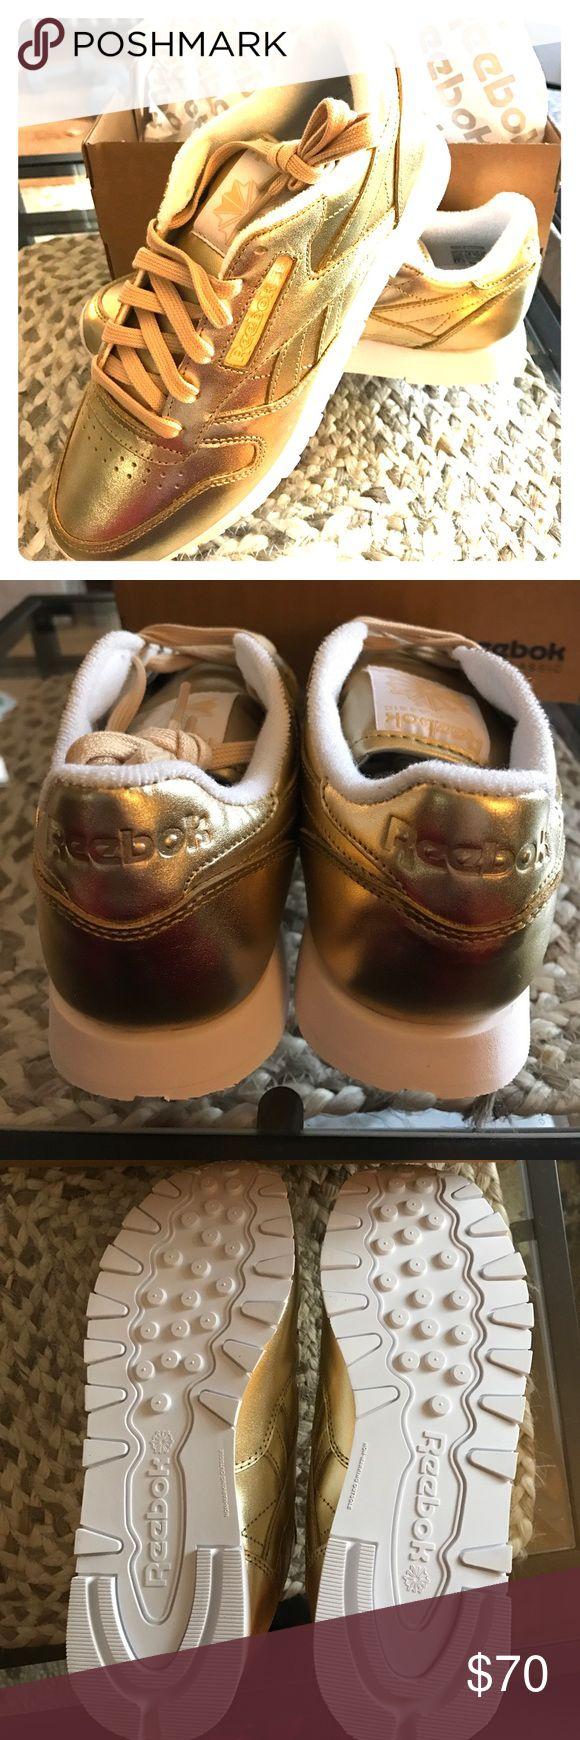 BRAND NEW Gold Reebok Classic Sneakers Amazing pair of brand new gold classic Reebok sneakers. Never worn! Reebok Shoes Sneakers